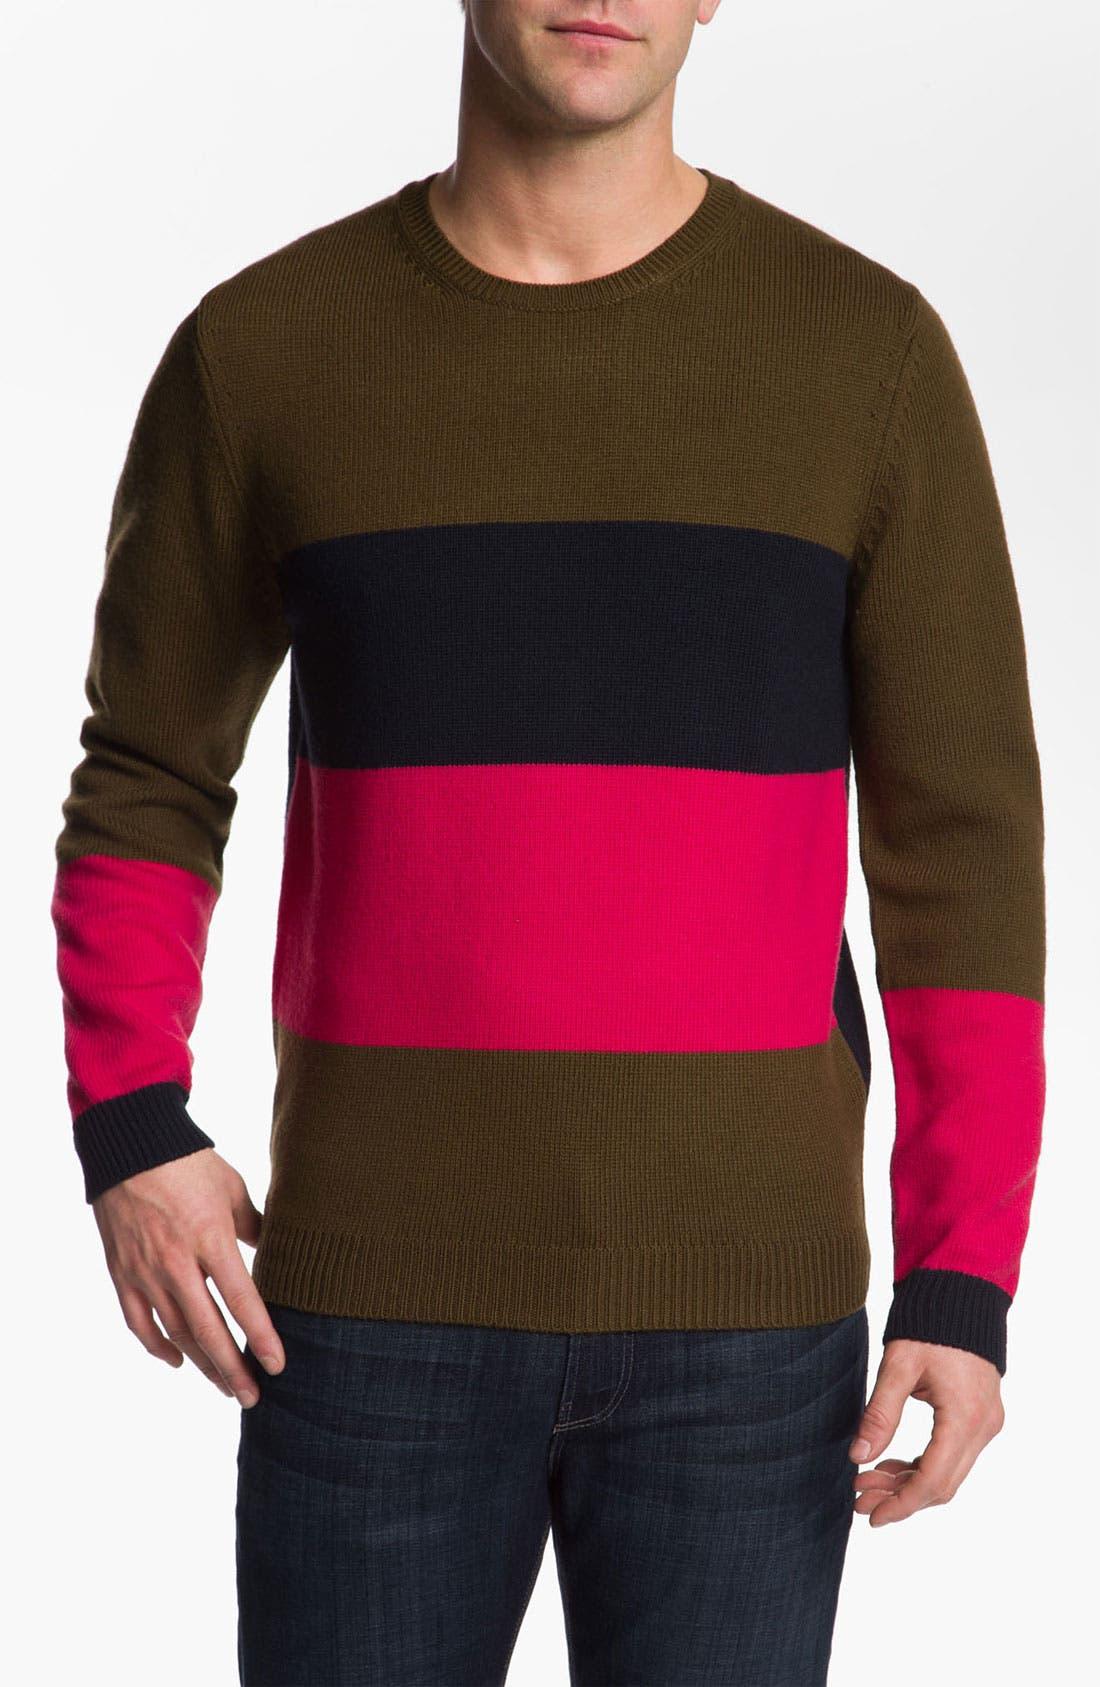 Alternate Image 1 Selected - MARC BY MARC JACOBS 'Freddie' Wool Crewneck Sweater